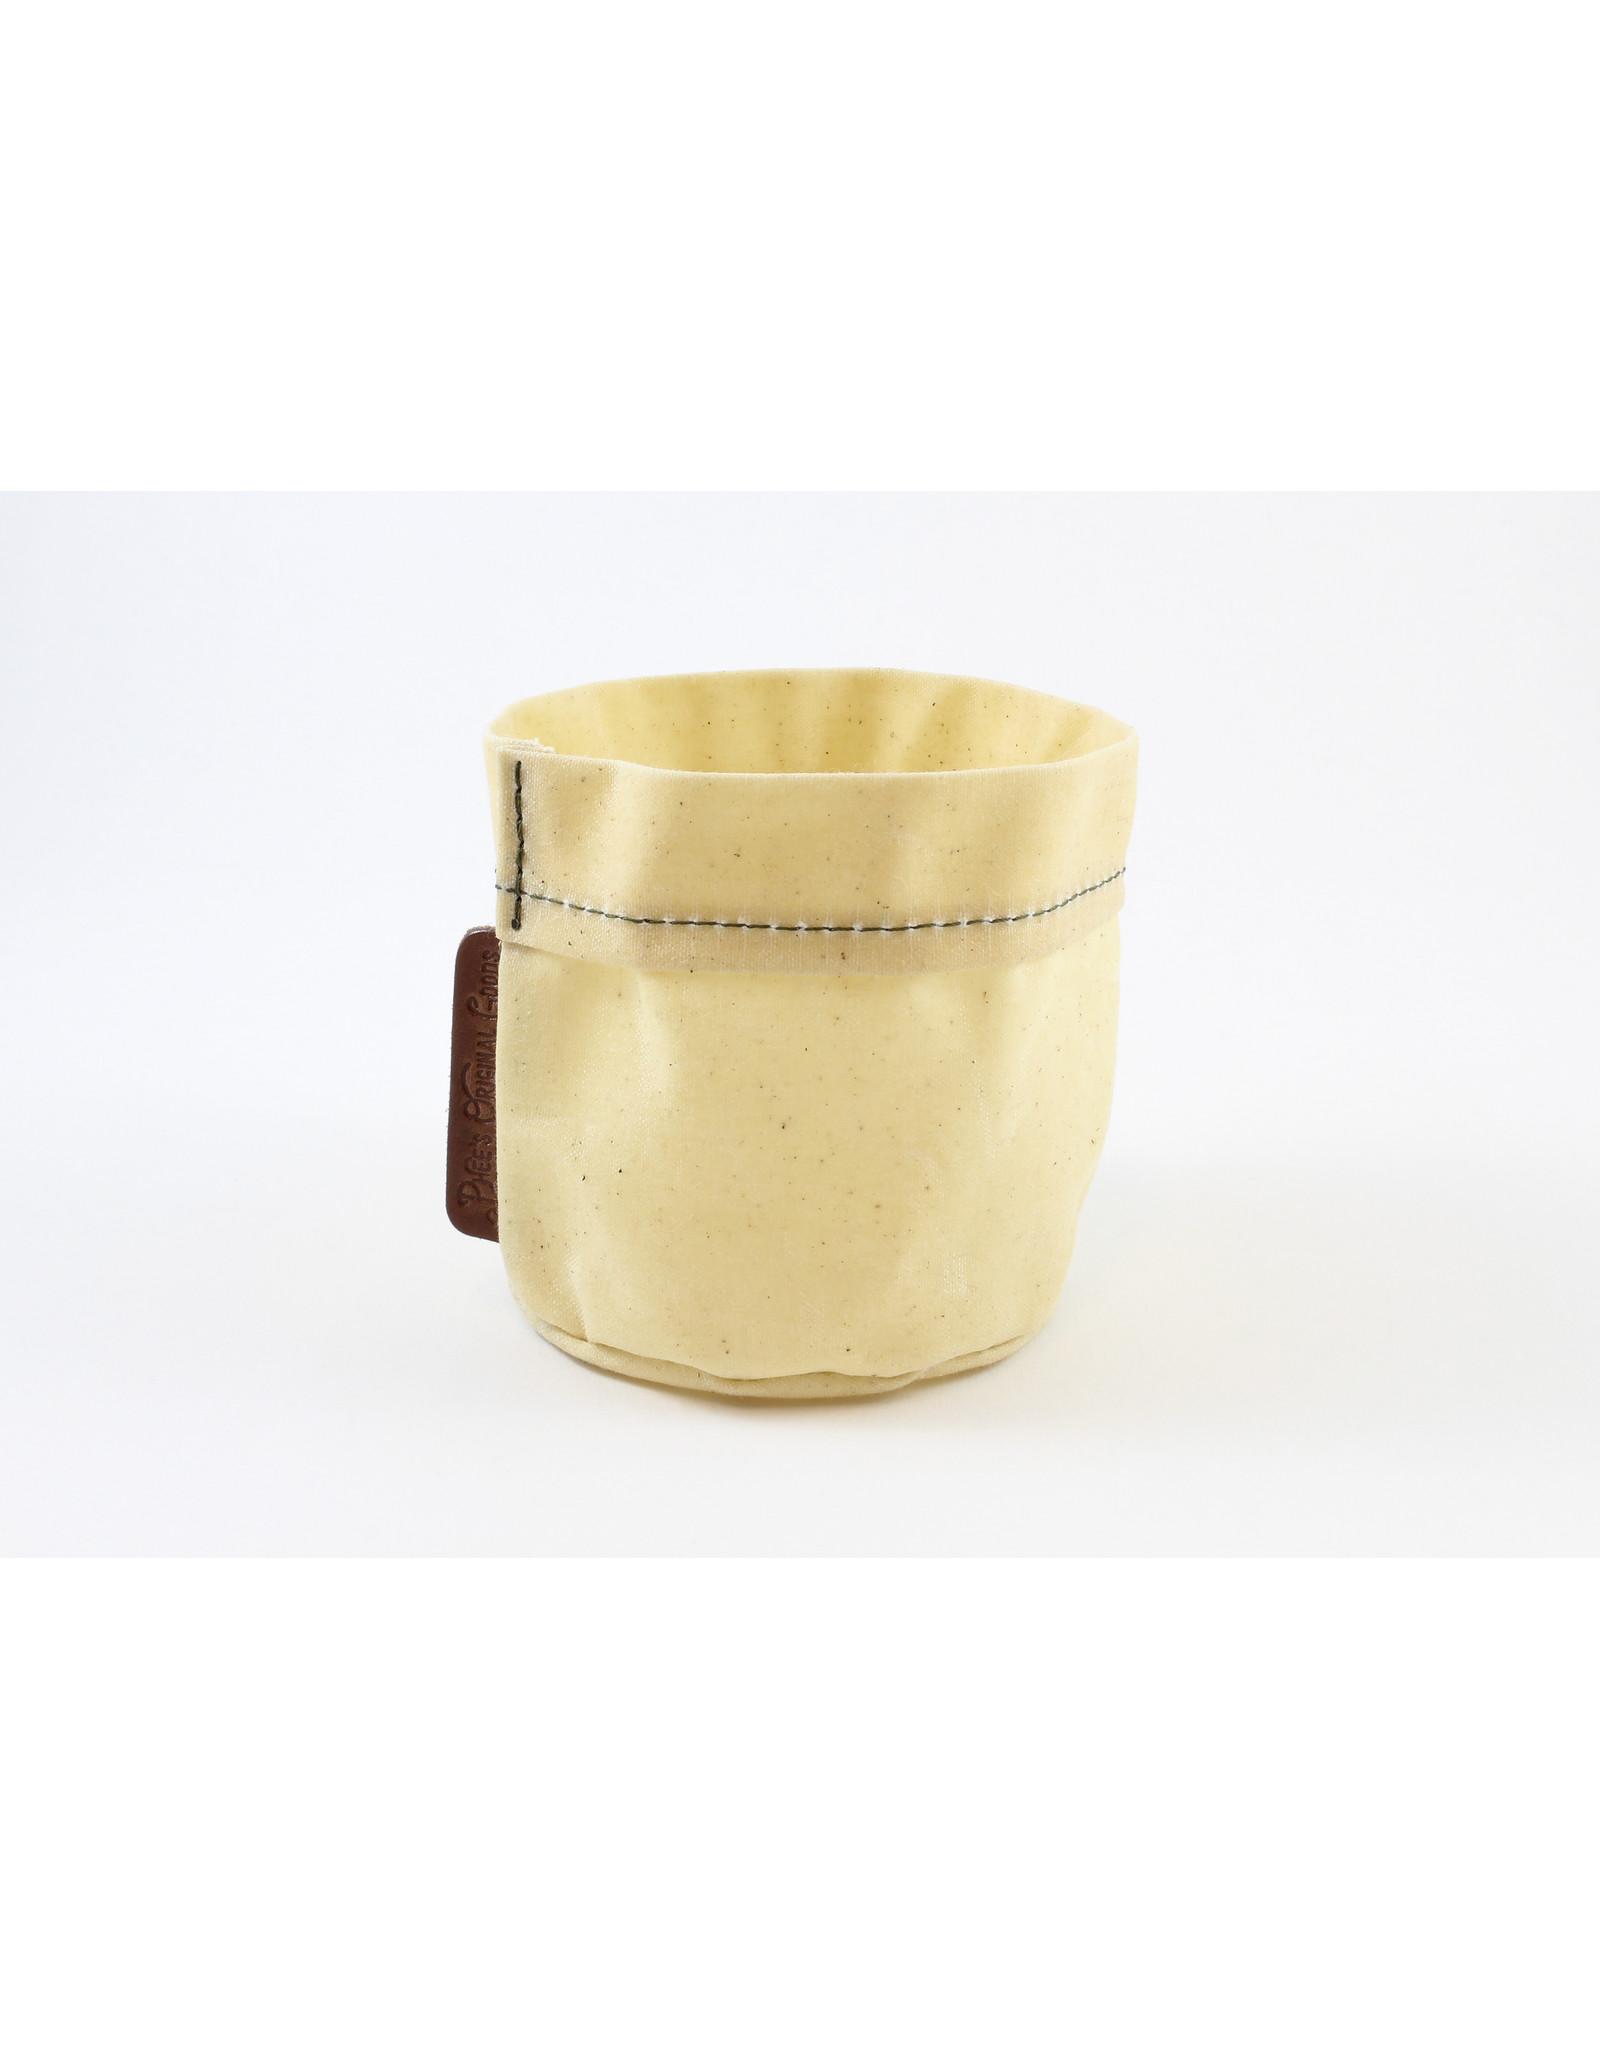 Kyle McPhee Waxed Canvas Bucket by Phee's Original Goods